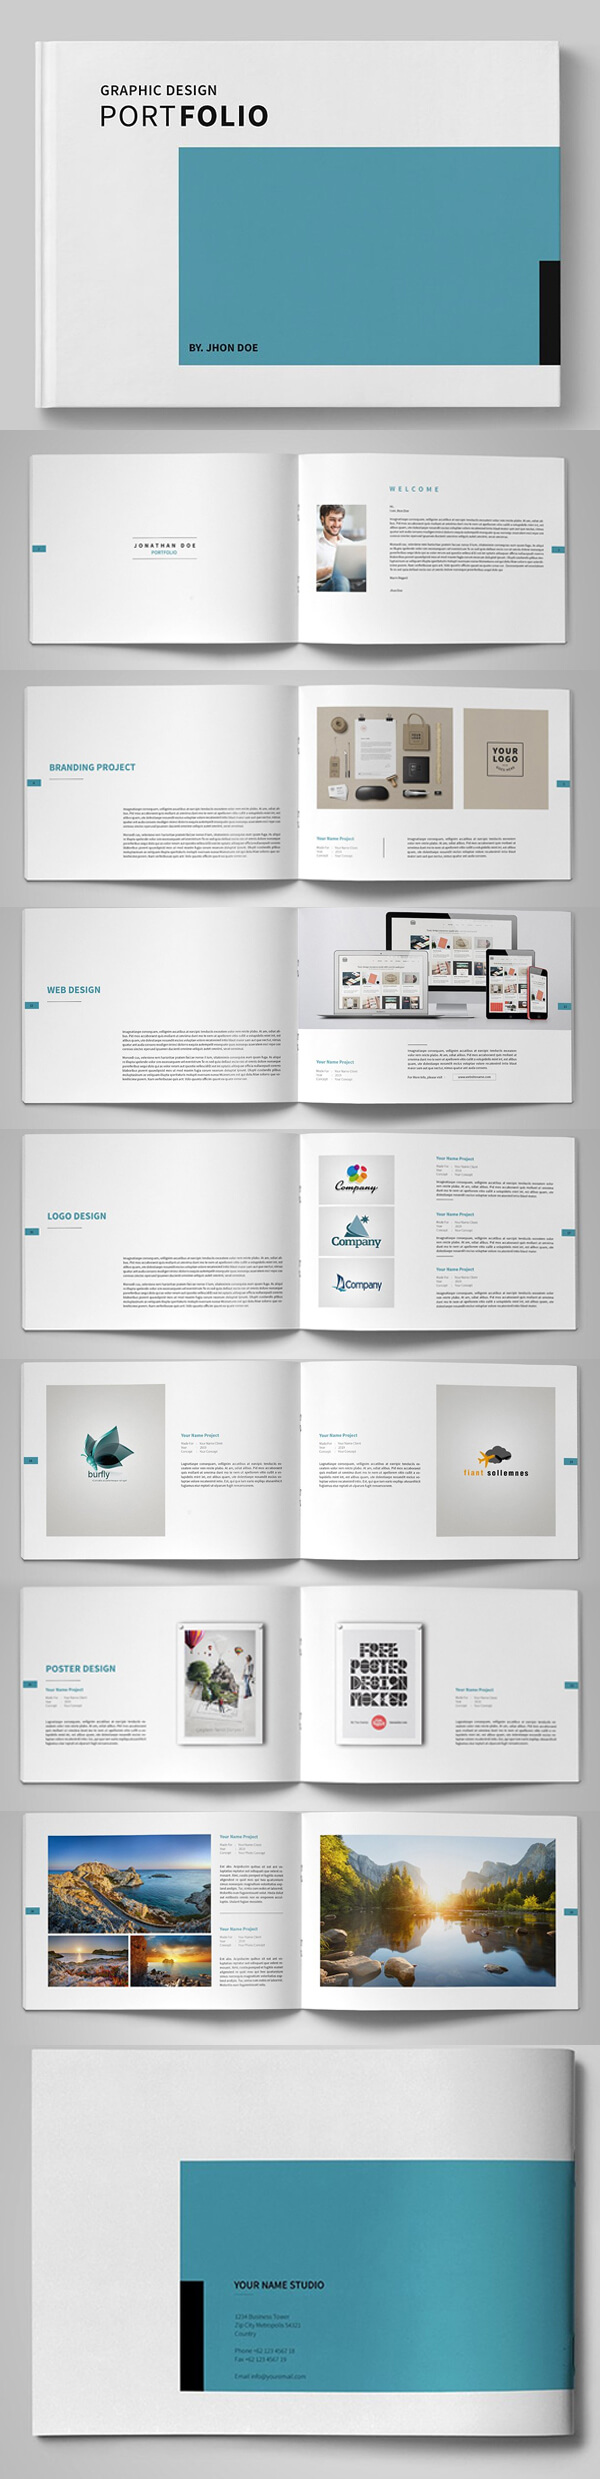 20 New Professional Catalog Brochure Templates | Design Throughout Brochure Template Indesign Free Download